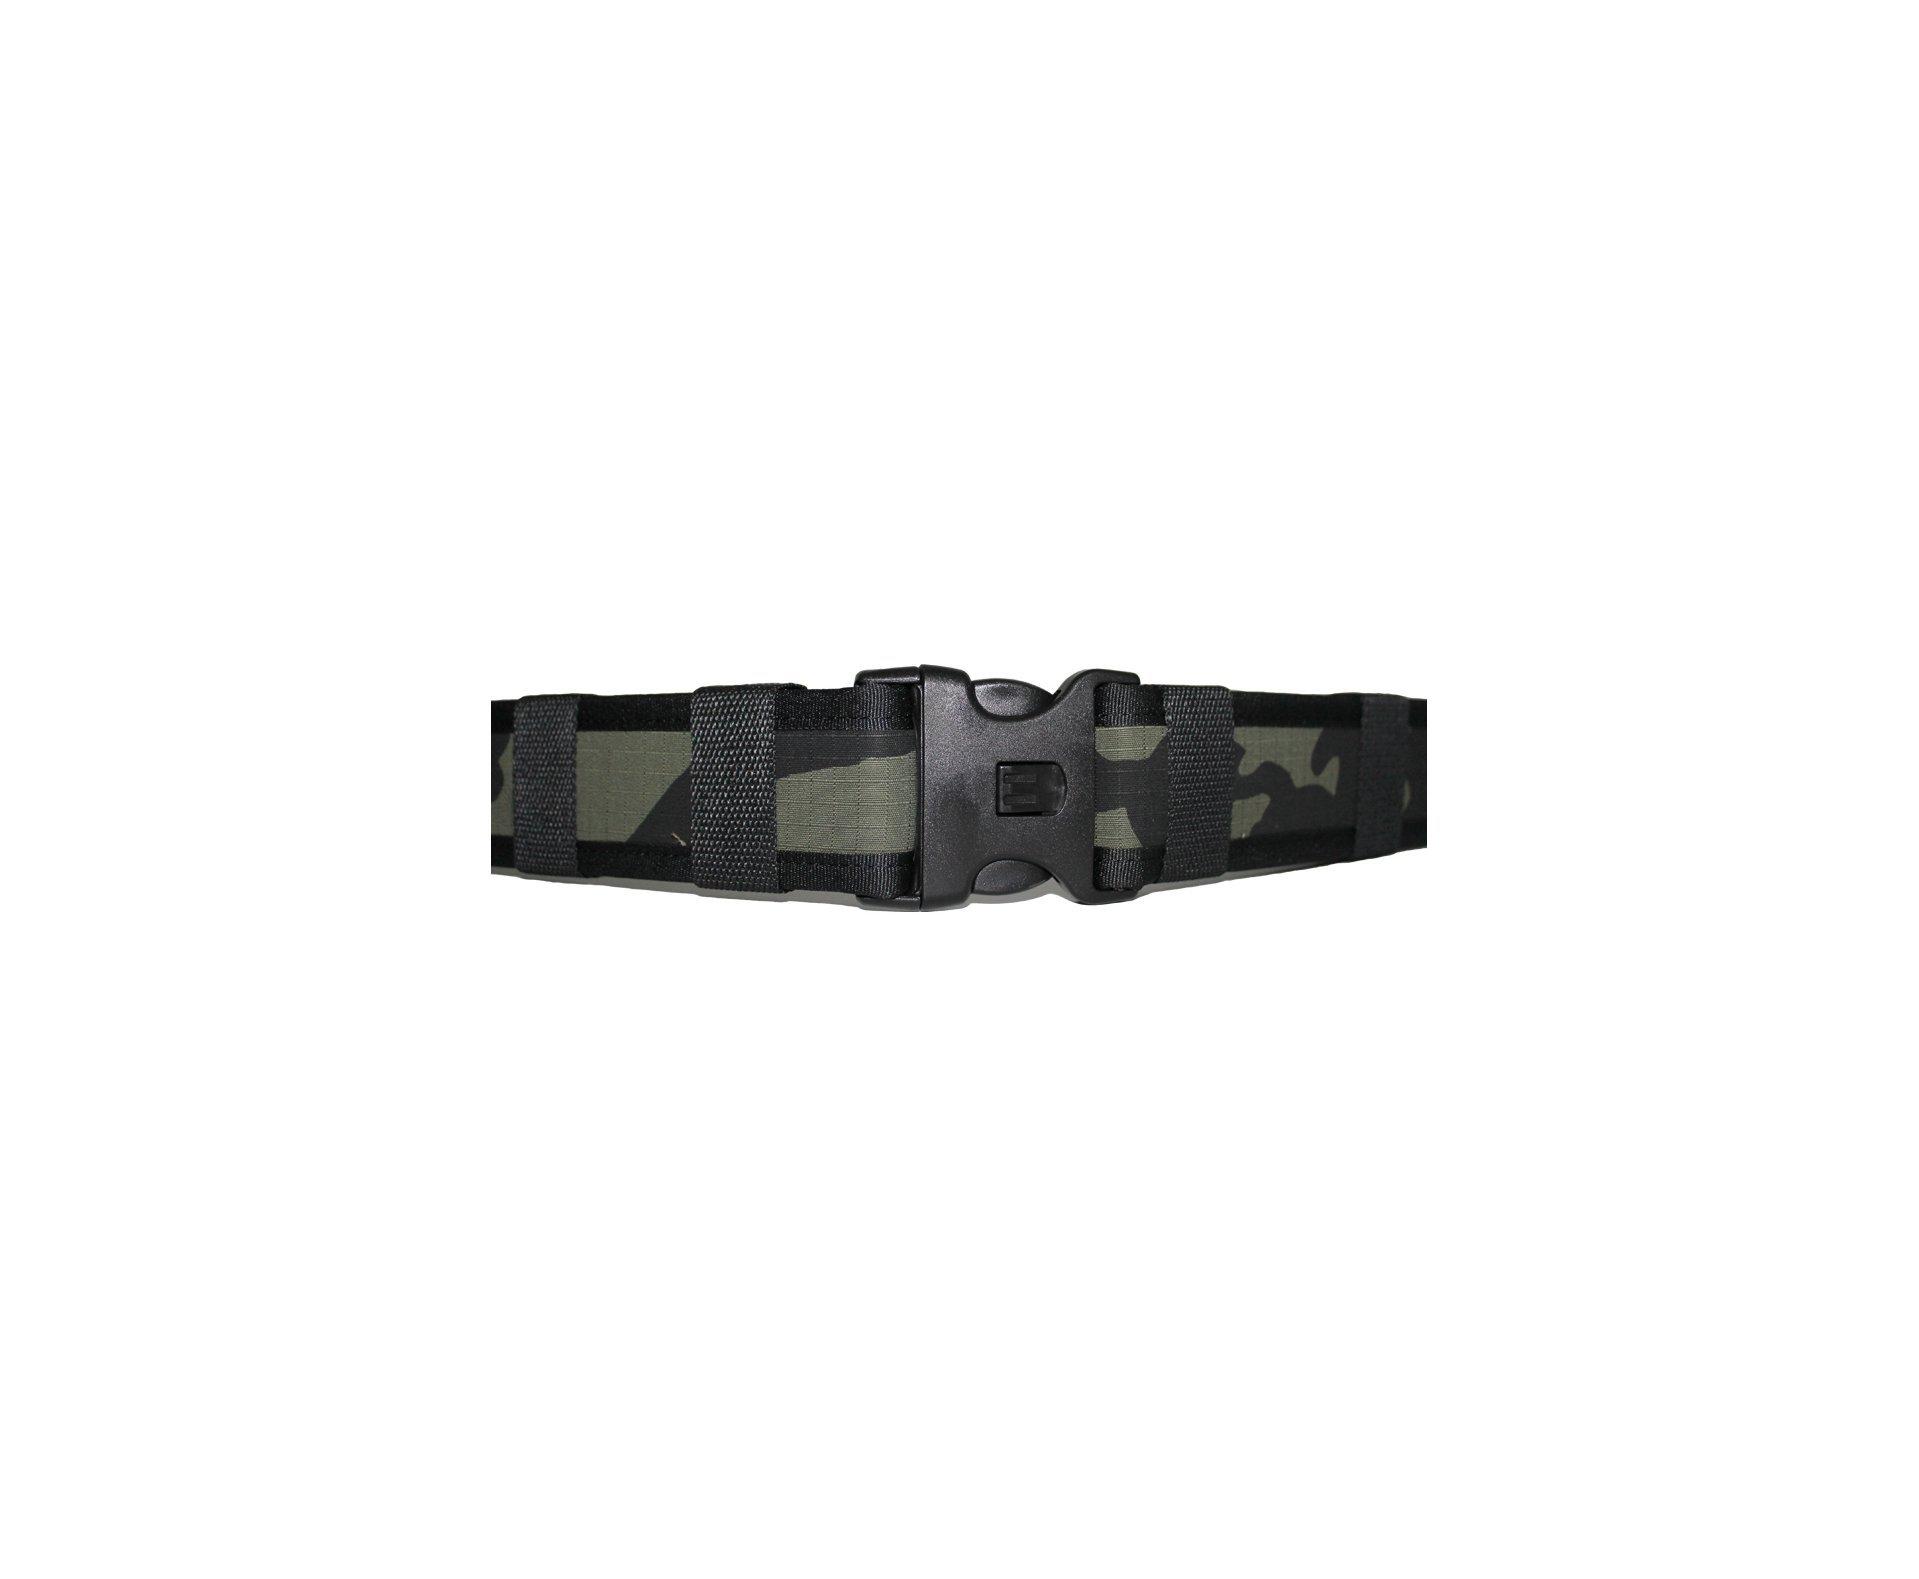 Cinto Tático Camuflado Ajustavel - Swiss+ Arms